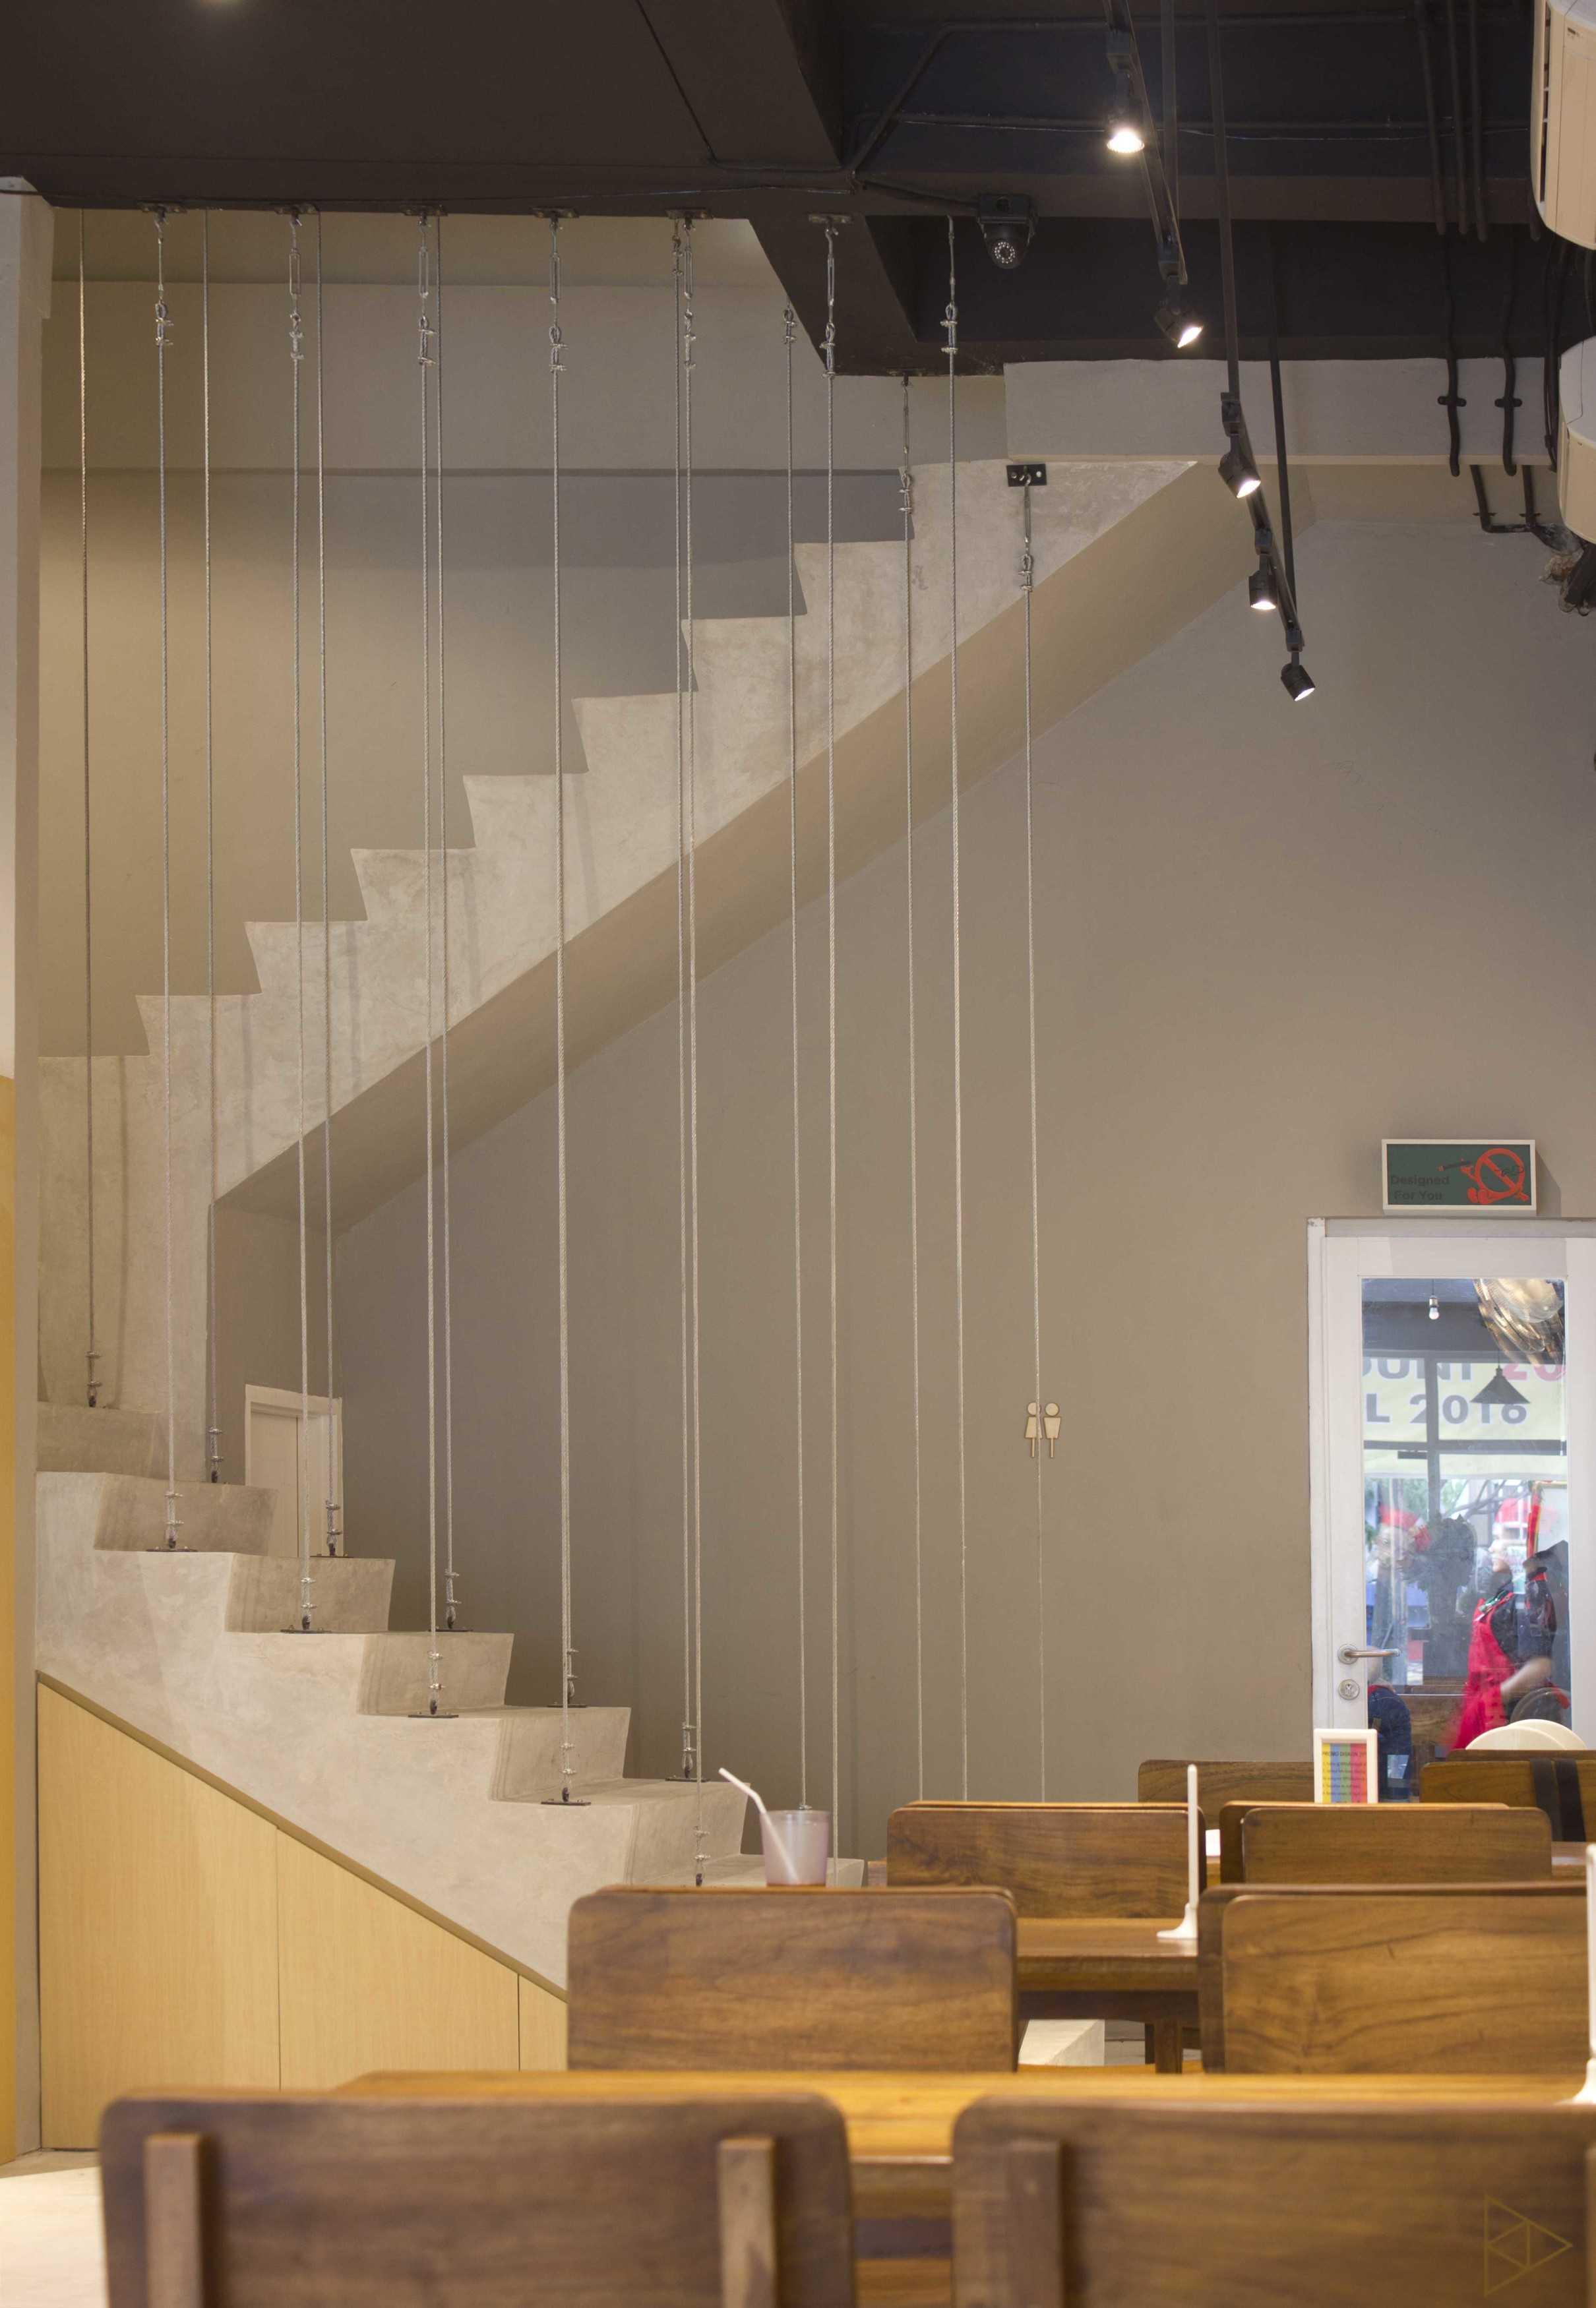 Ties Design & Build 90'S Flazback Cafe Klp. Indah, Kec. Tangerang, Kota Tangerang, Banten, Indonesia Klp. Indah, Kec. Tangerang, Kota Tangerang, Banten, Indonesia Stair - 1St Floor   68653